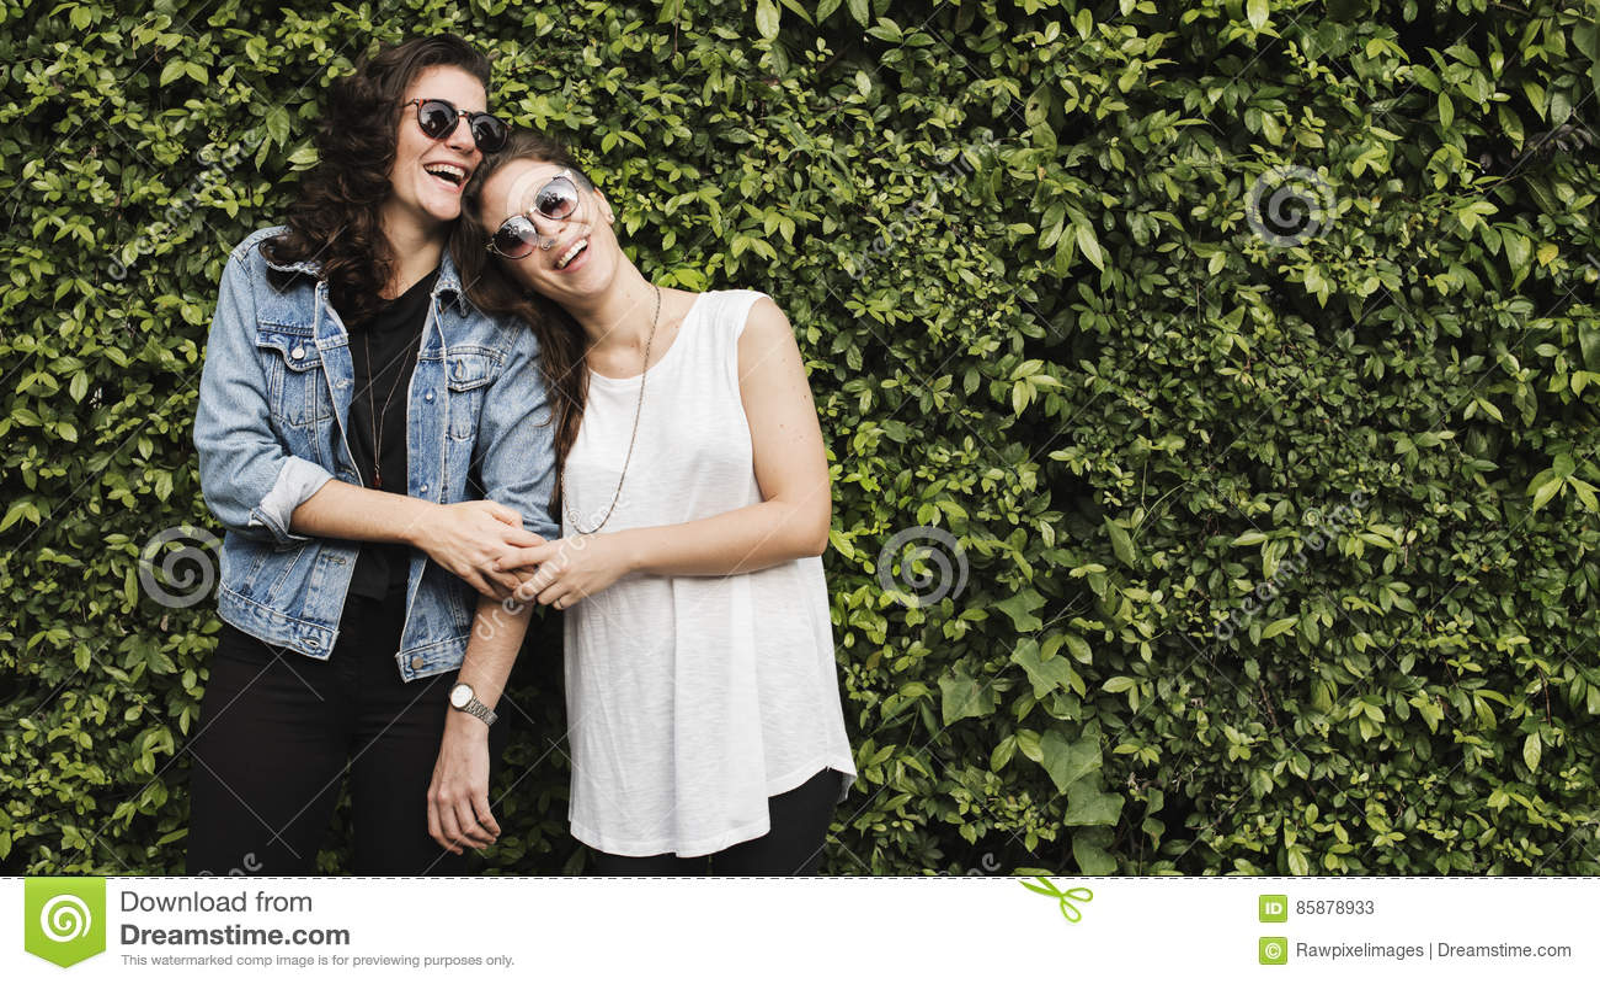 Lesbisch Paar samen in openlucht Concept